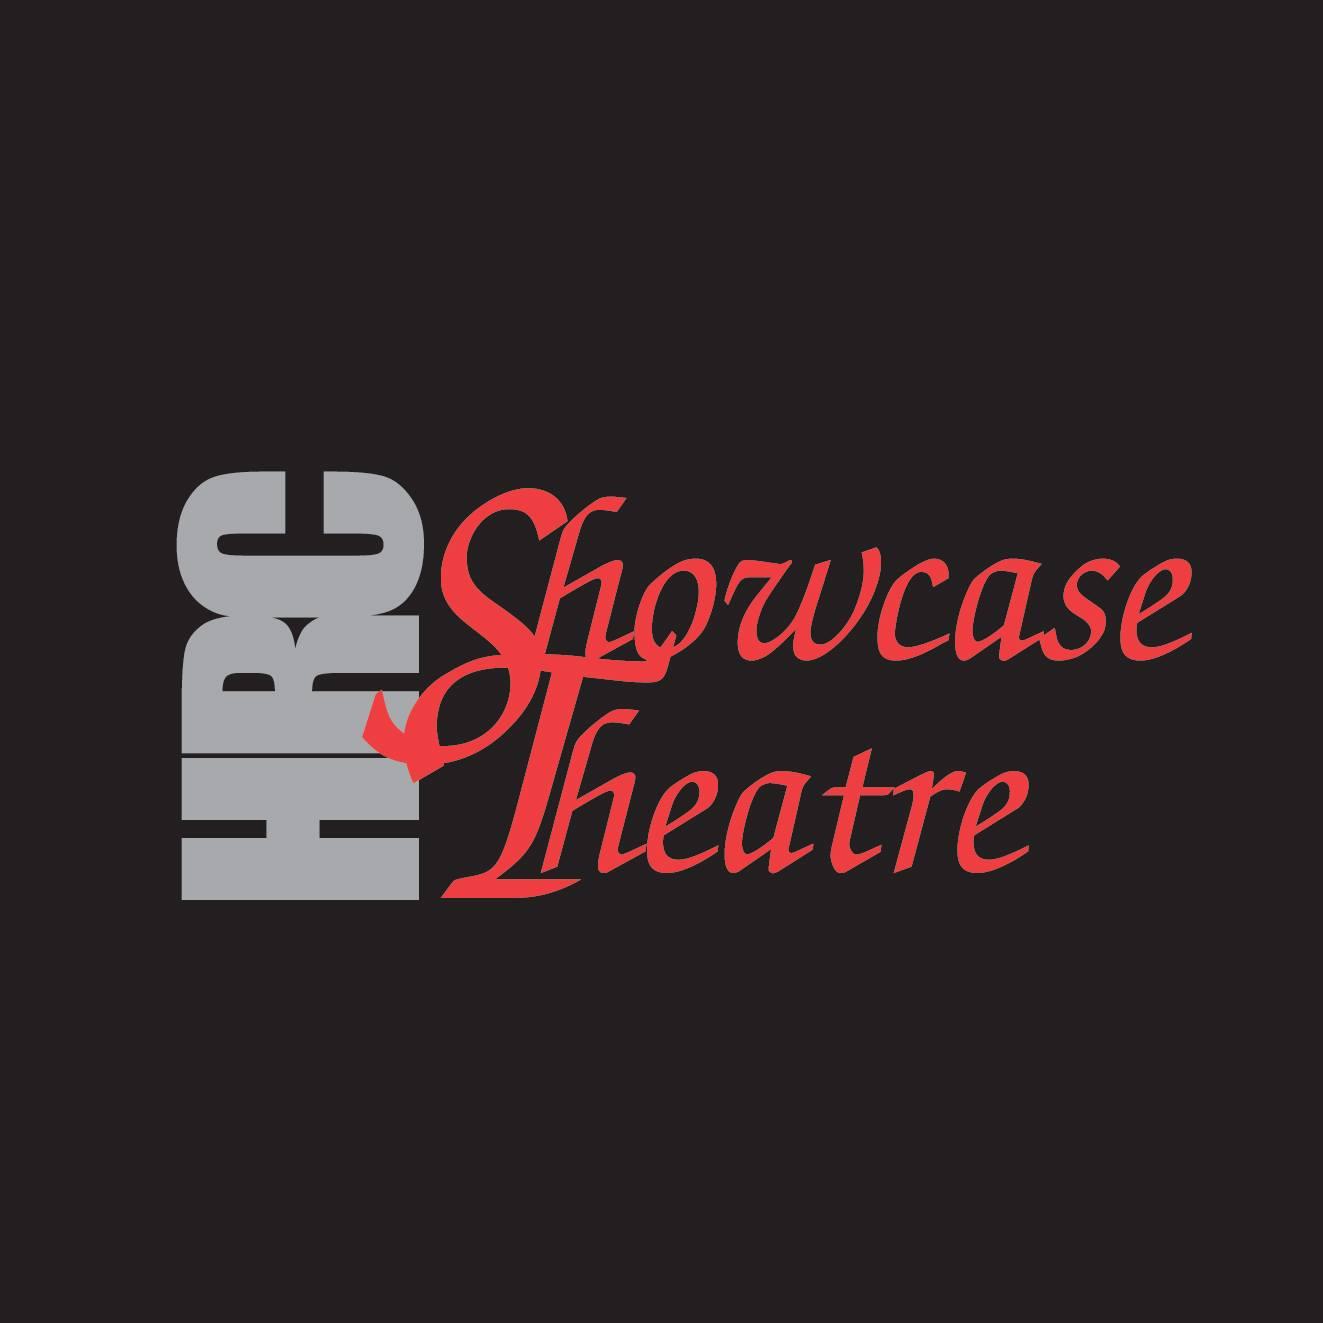 HRC Showcase Theatre